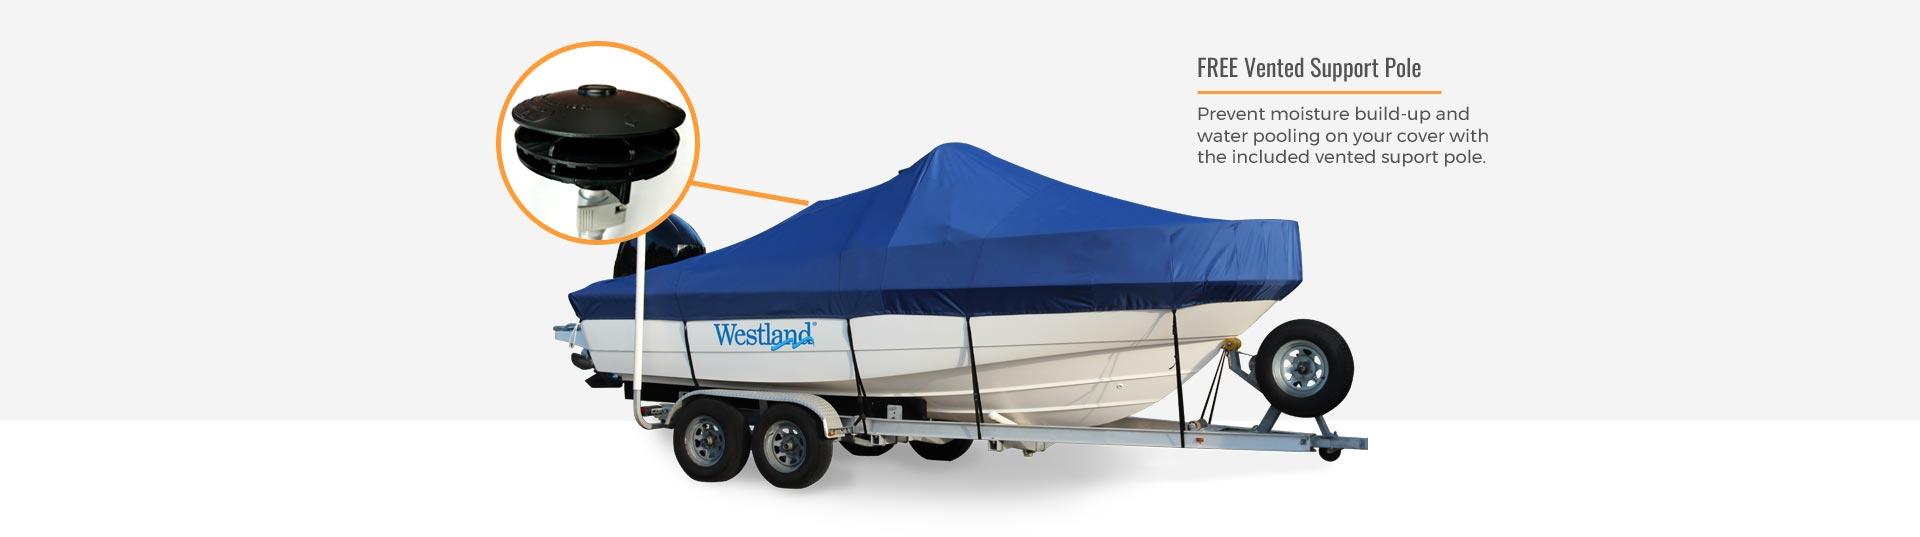 Westland boat cover pole